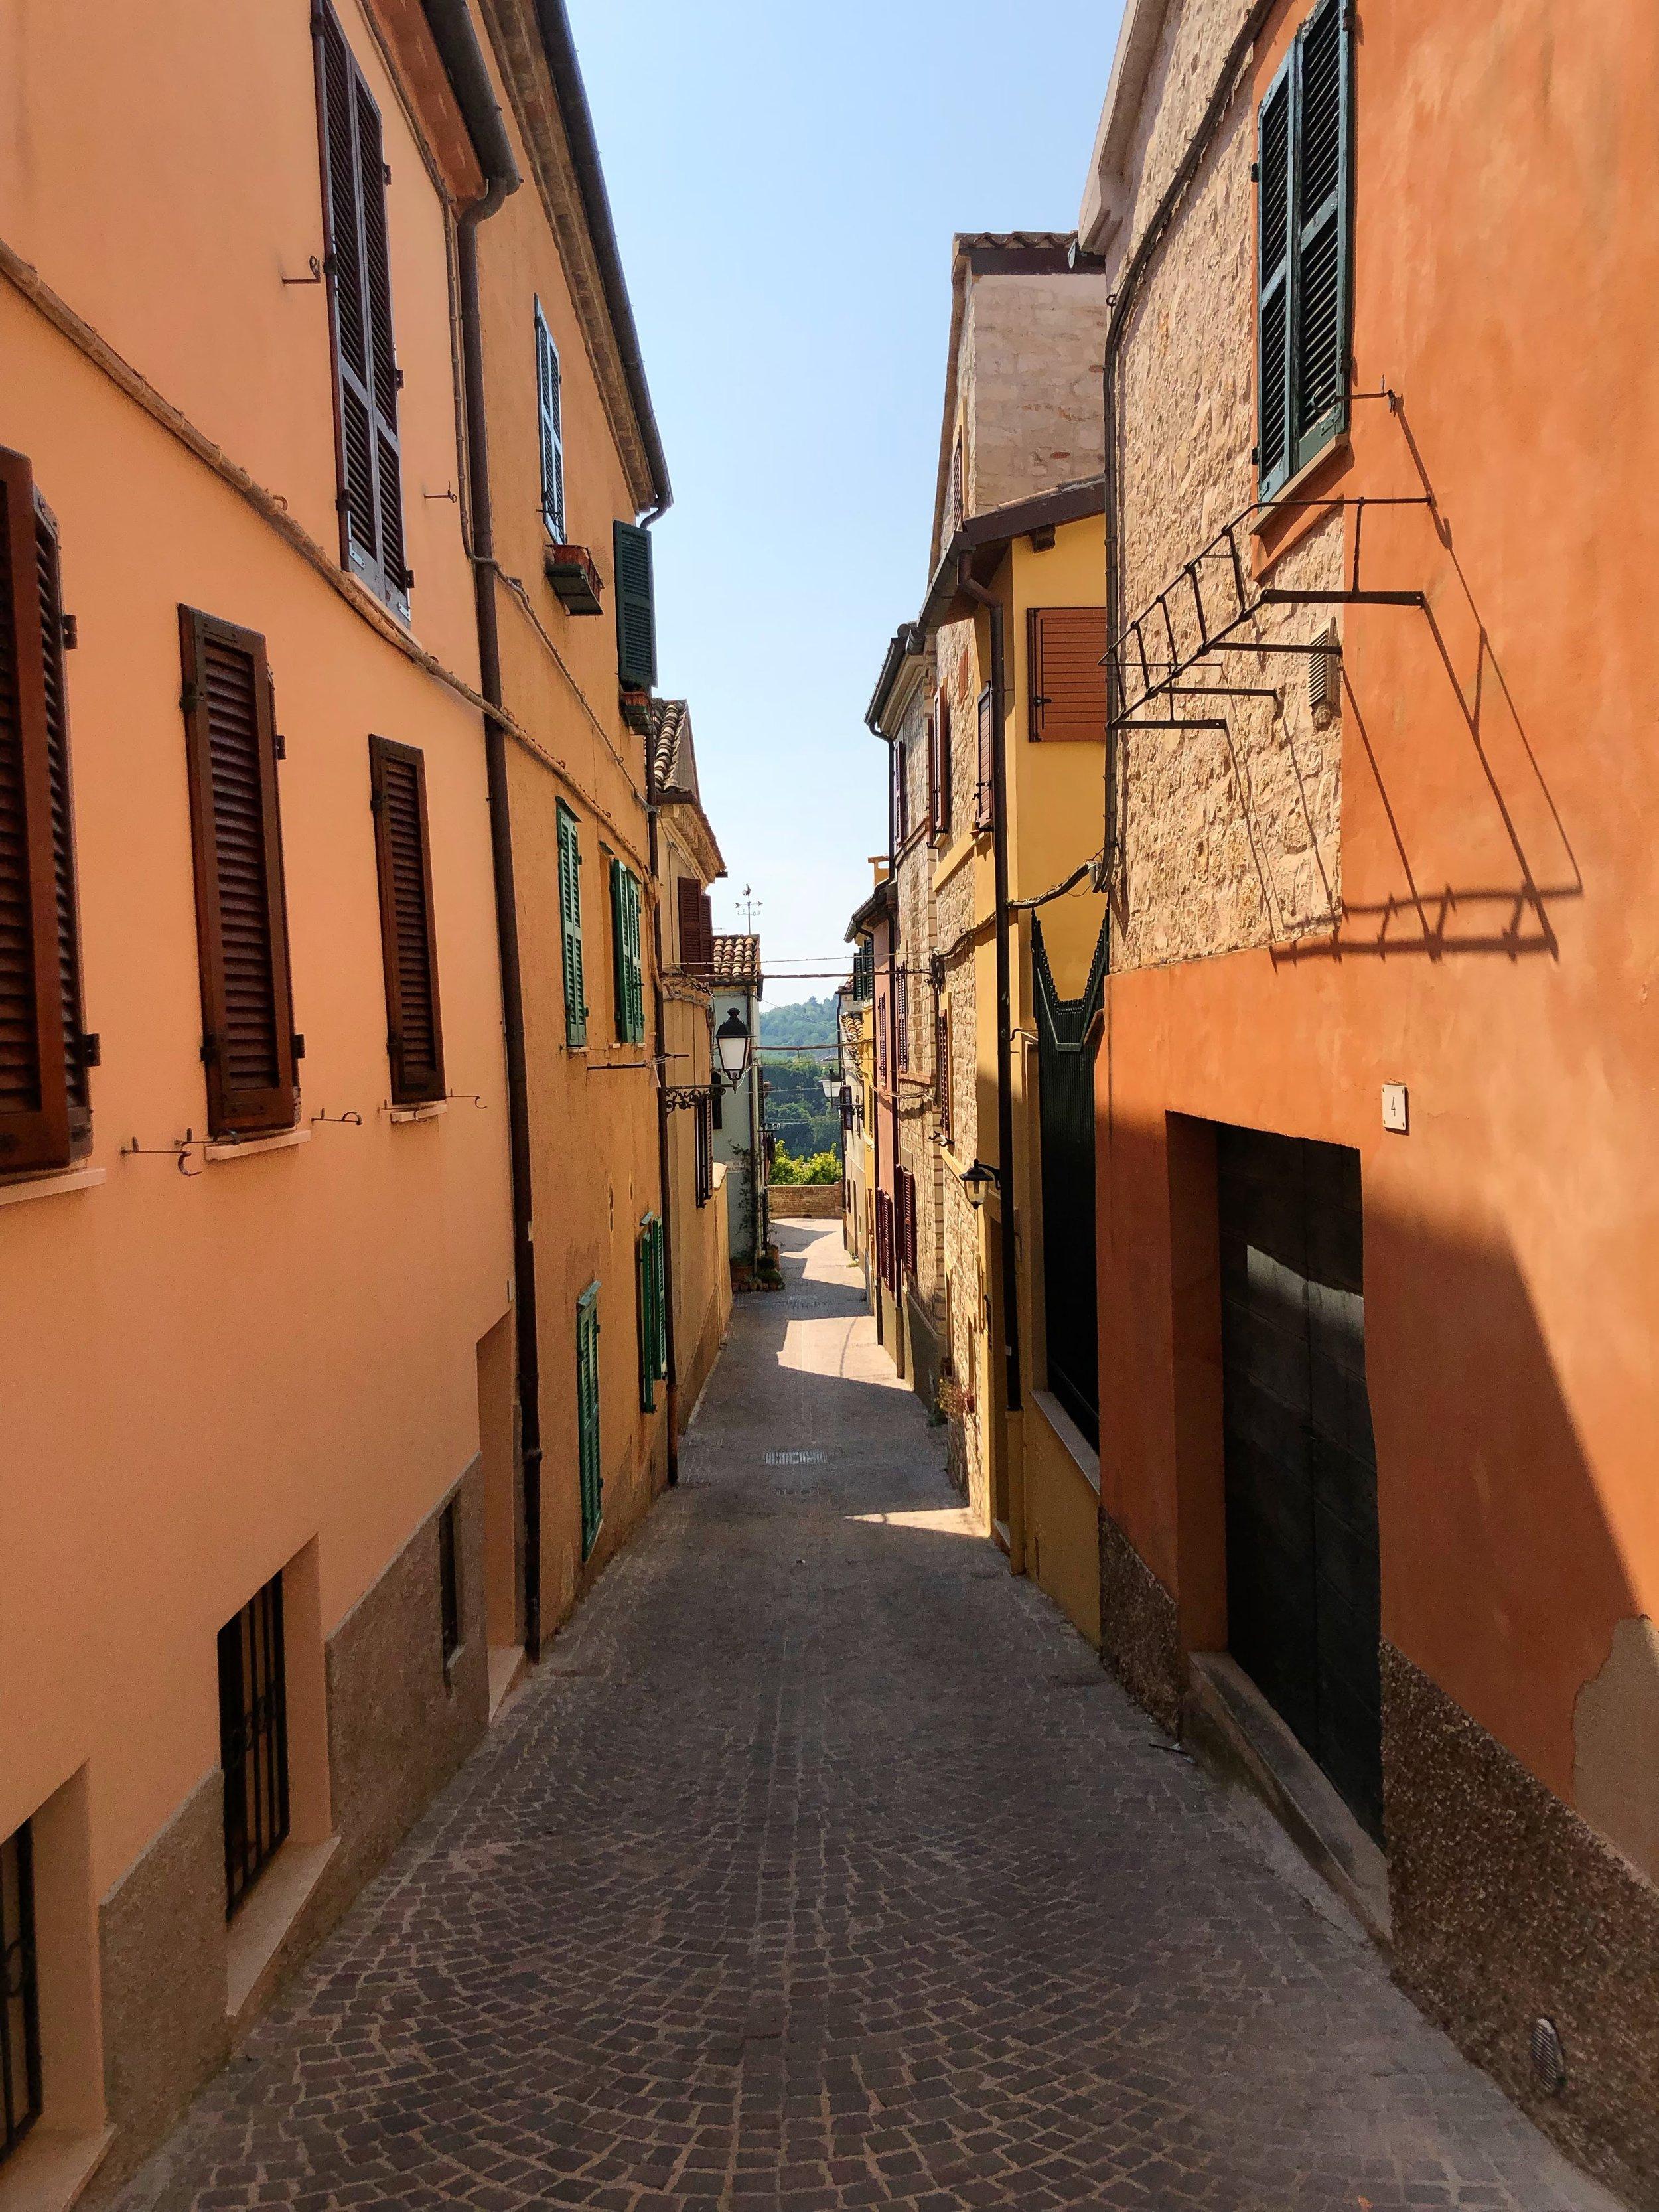 Stefano-Zulian-riviera-del coneroStefano-Zulian-IMG_9823.jpg